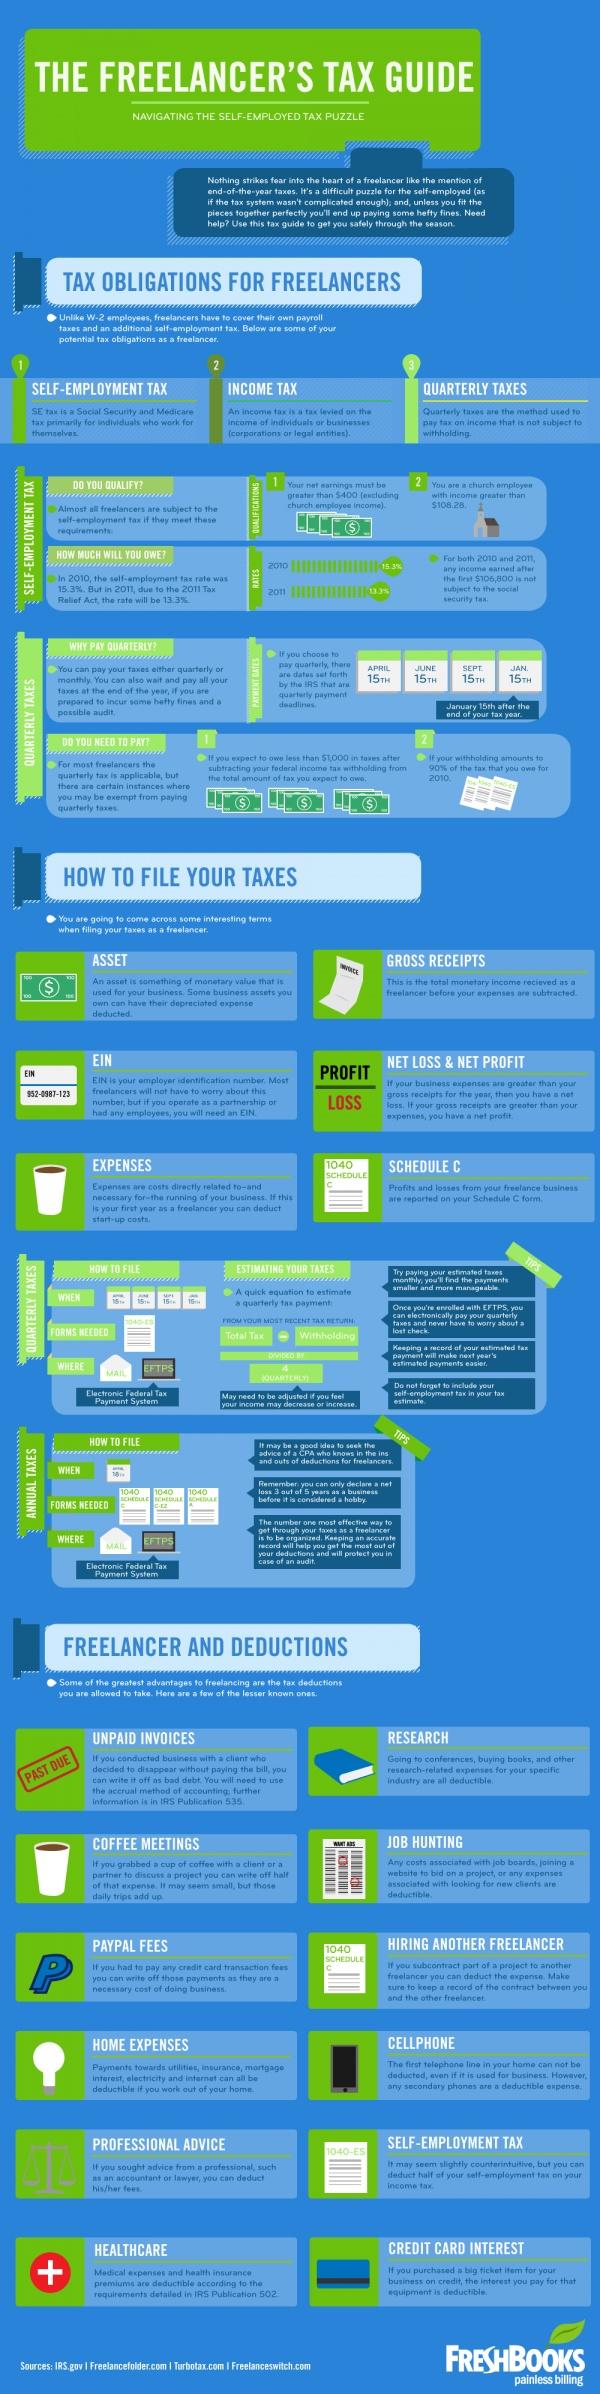 Freelancer Tax Guide